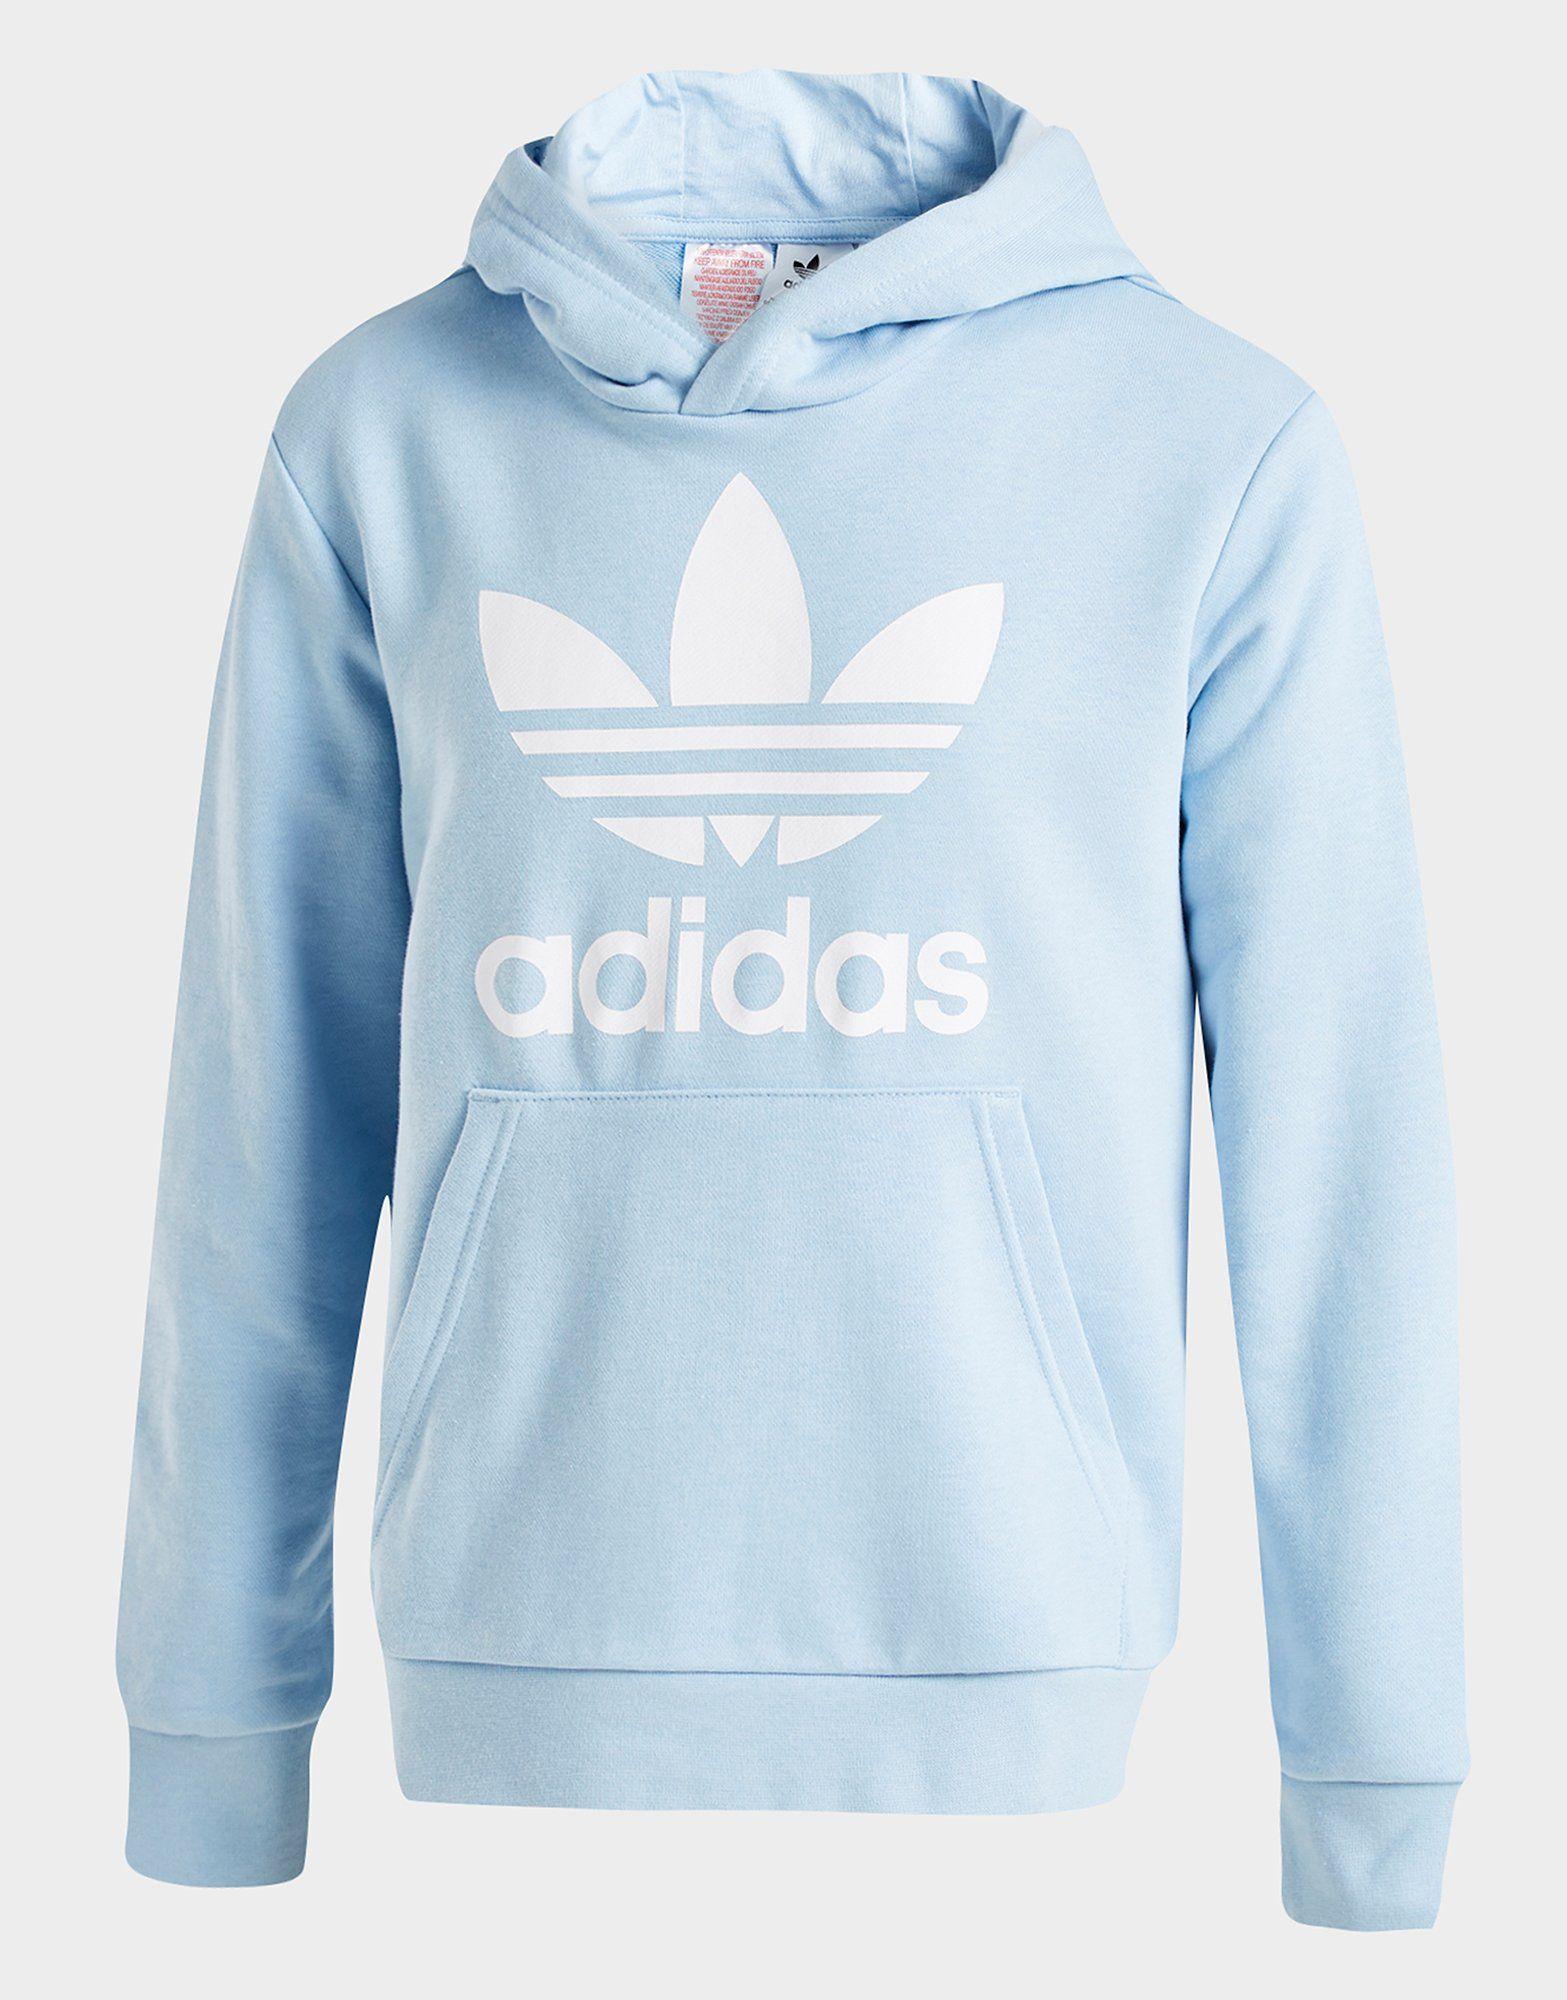 Sports JuniorJd Hoodie Originals Adicolour Adidas 8wmOn0vyN